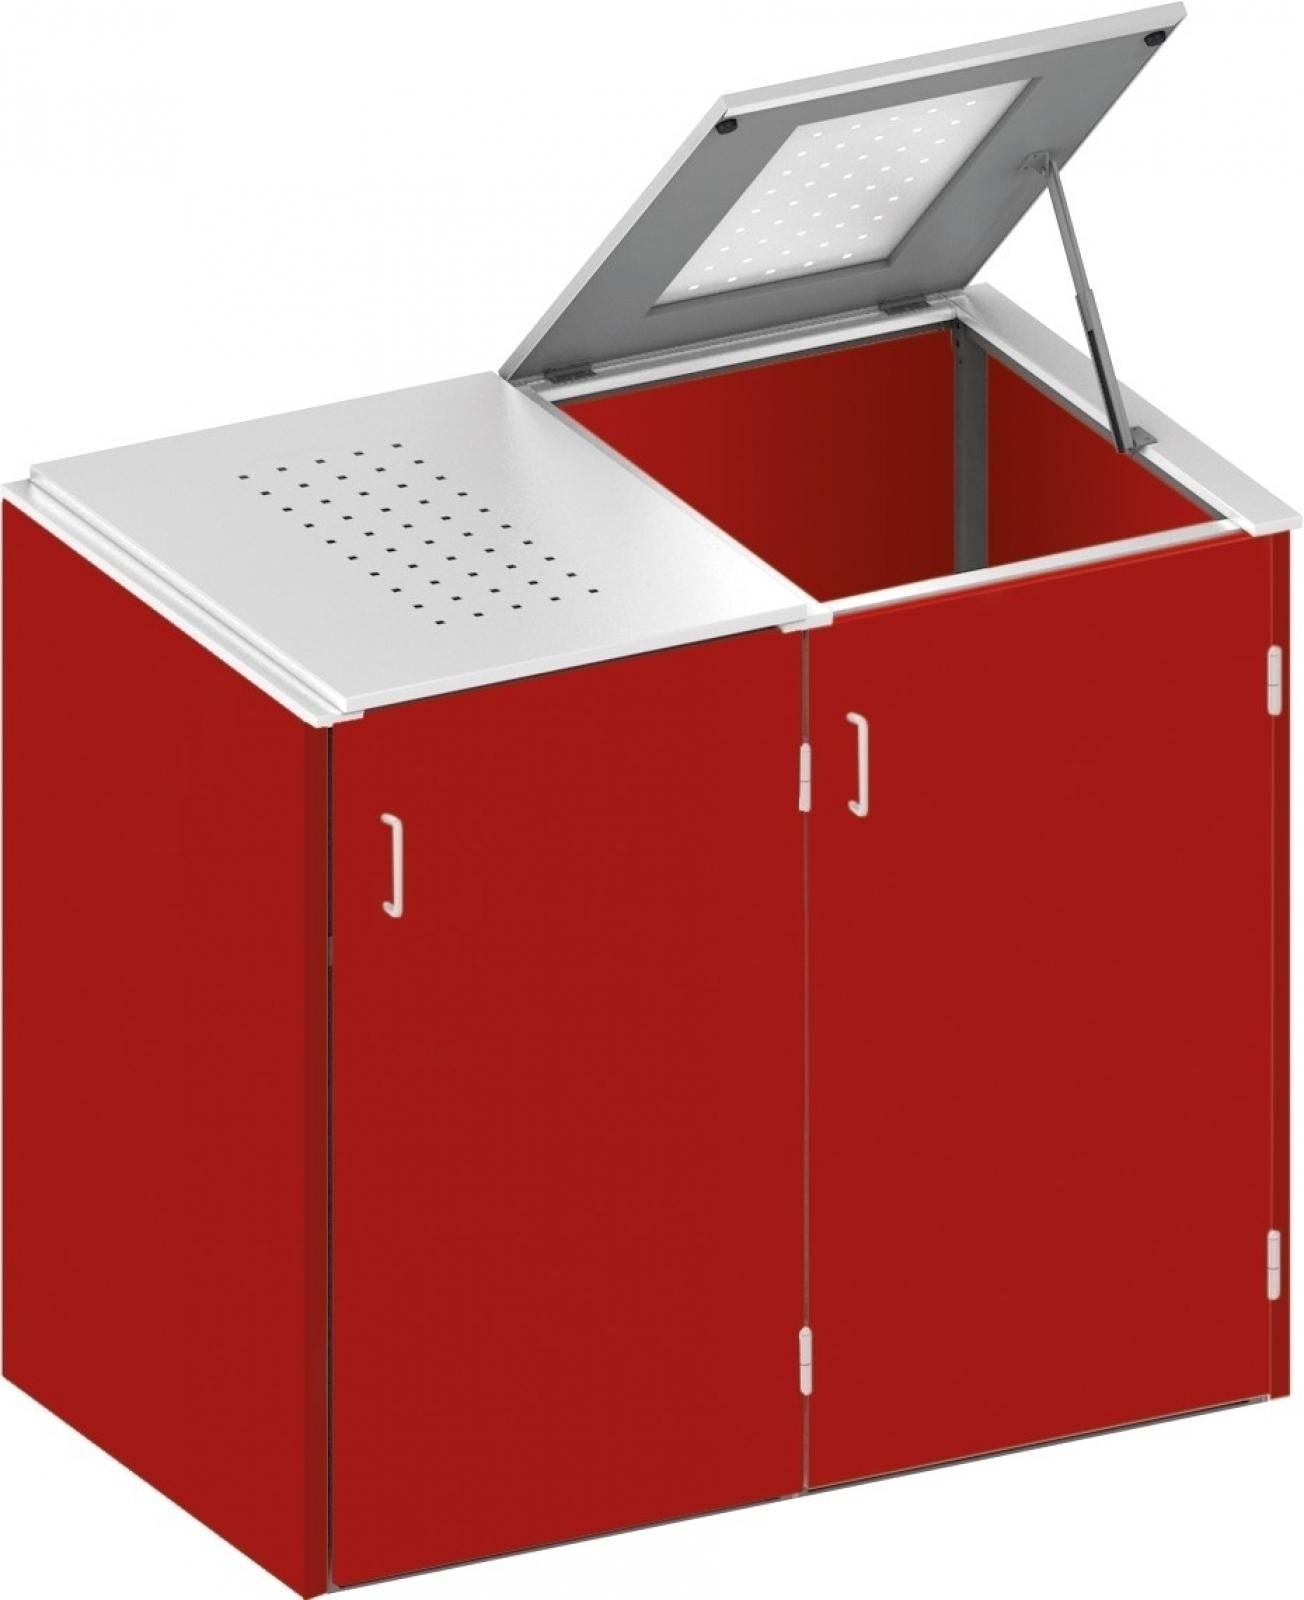 binto mülltonnenbox hpl rot - edelstahl system e2k